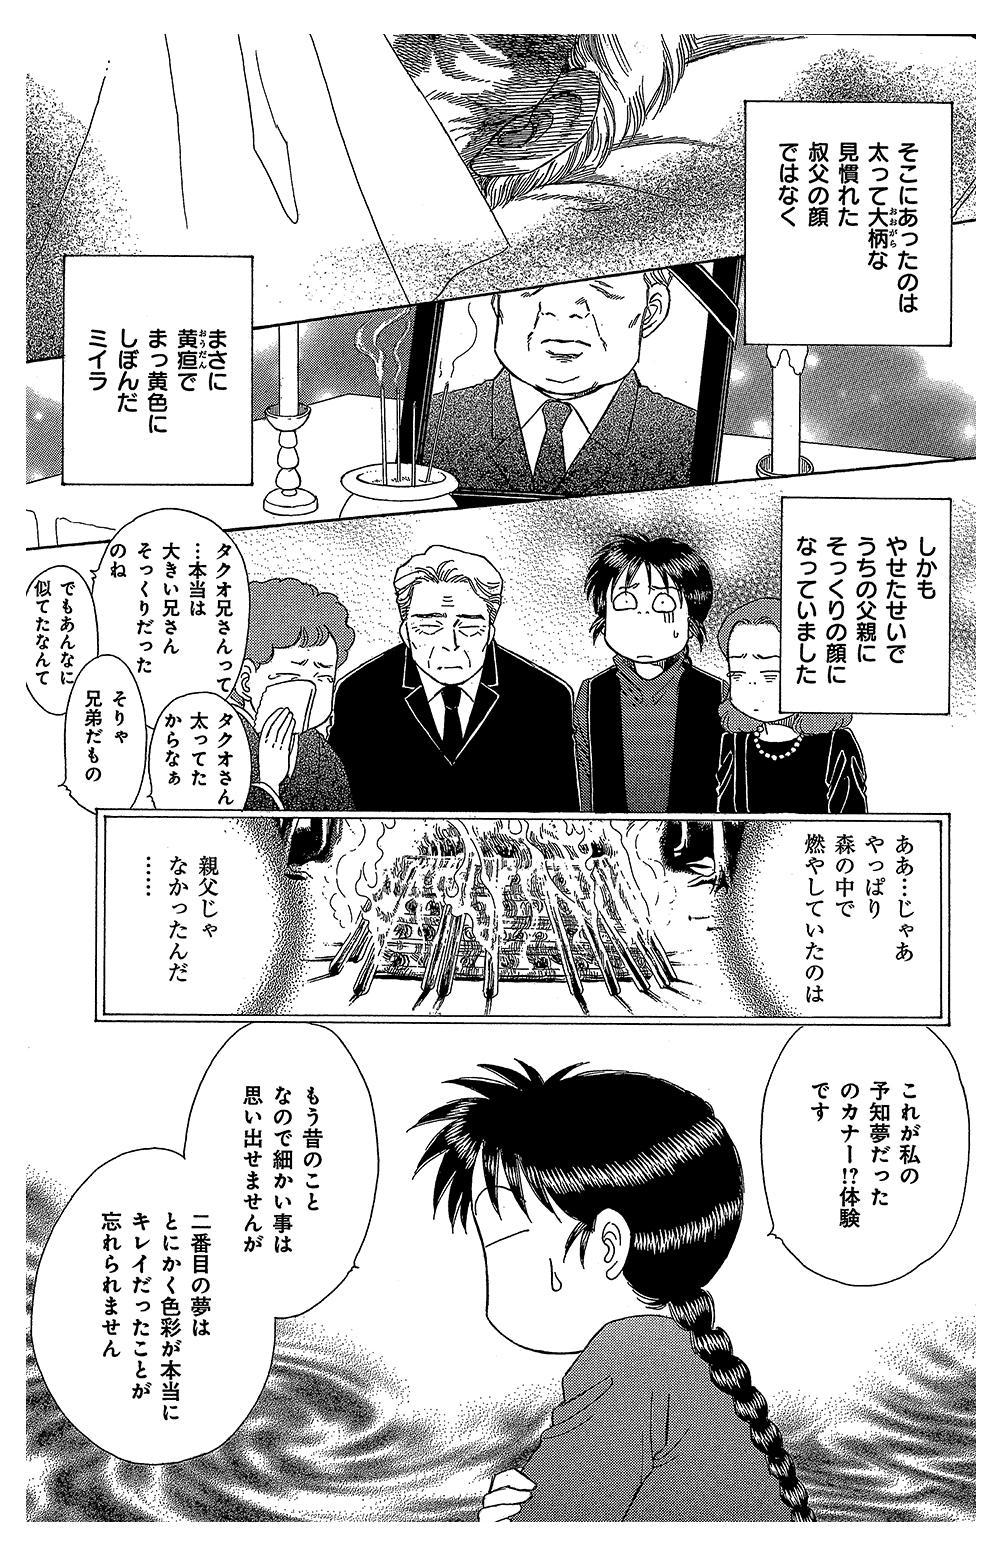 okaruto2-1-11.jpg